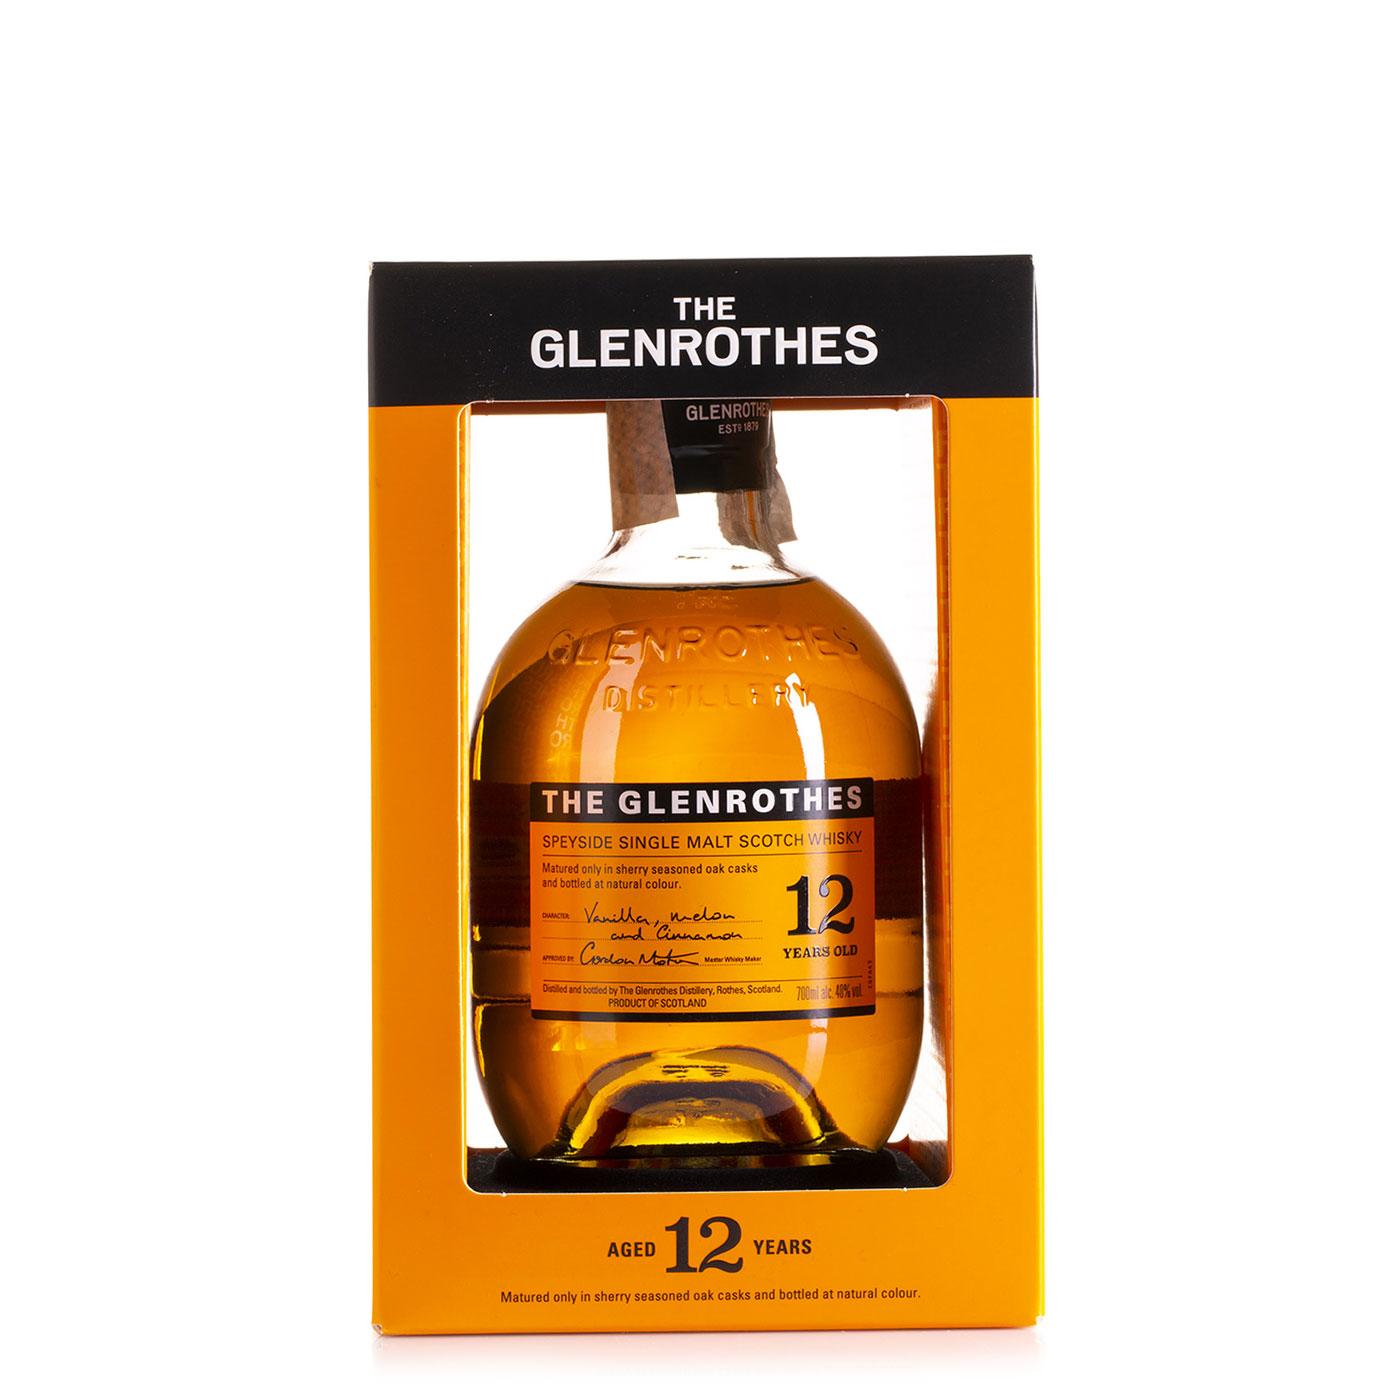 Glenrothes Speyside Single Malt Scotch Whisky 12 years old 0,70l